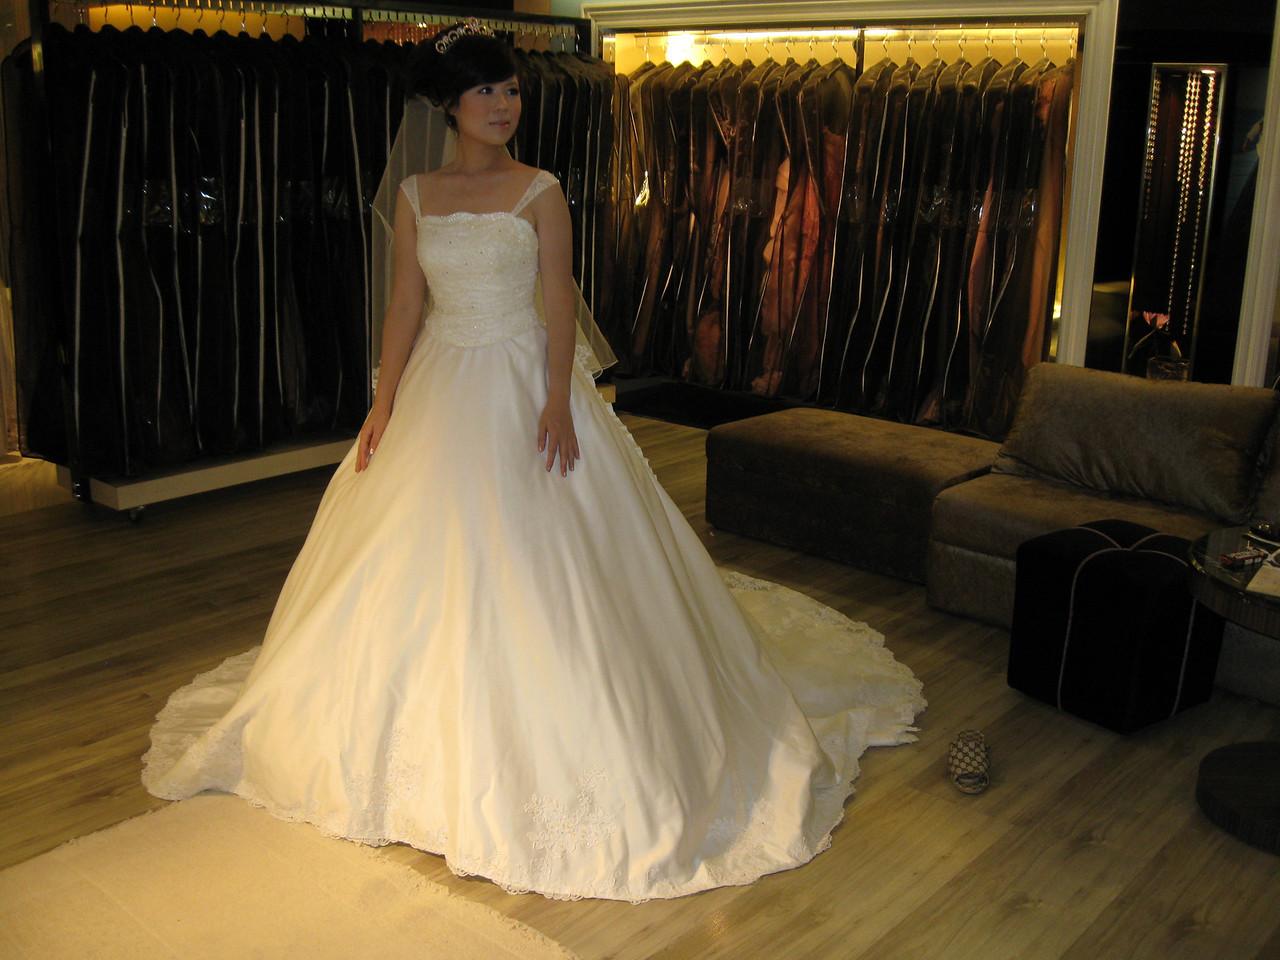 Potential wedding dress #2